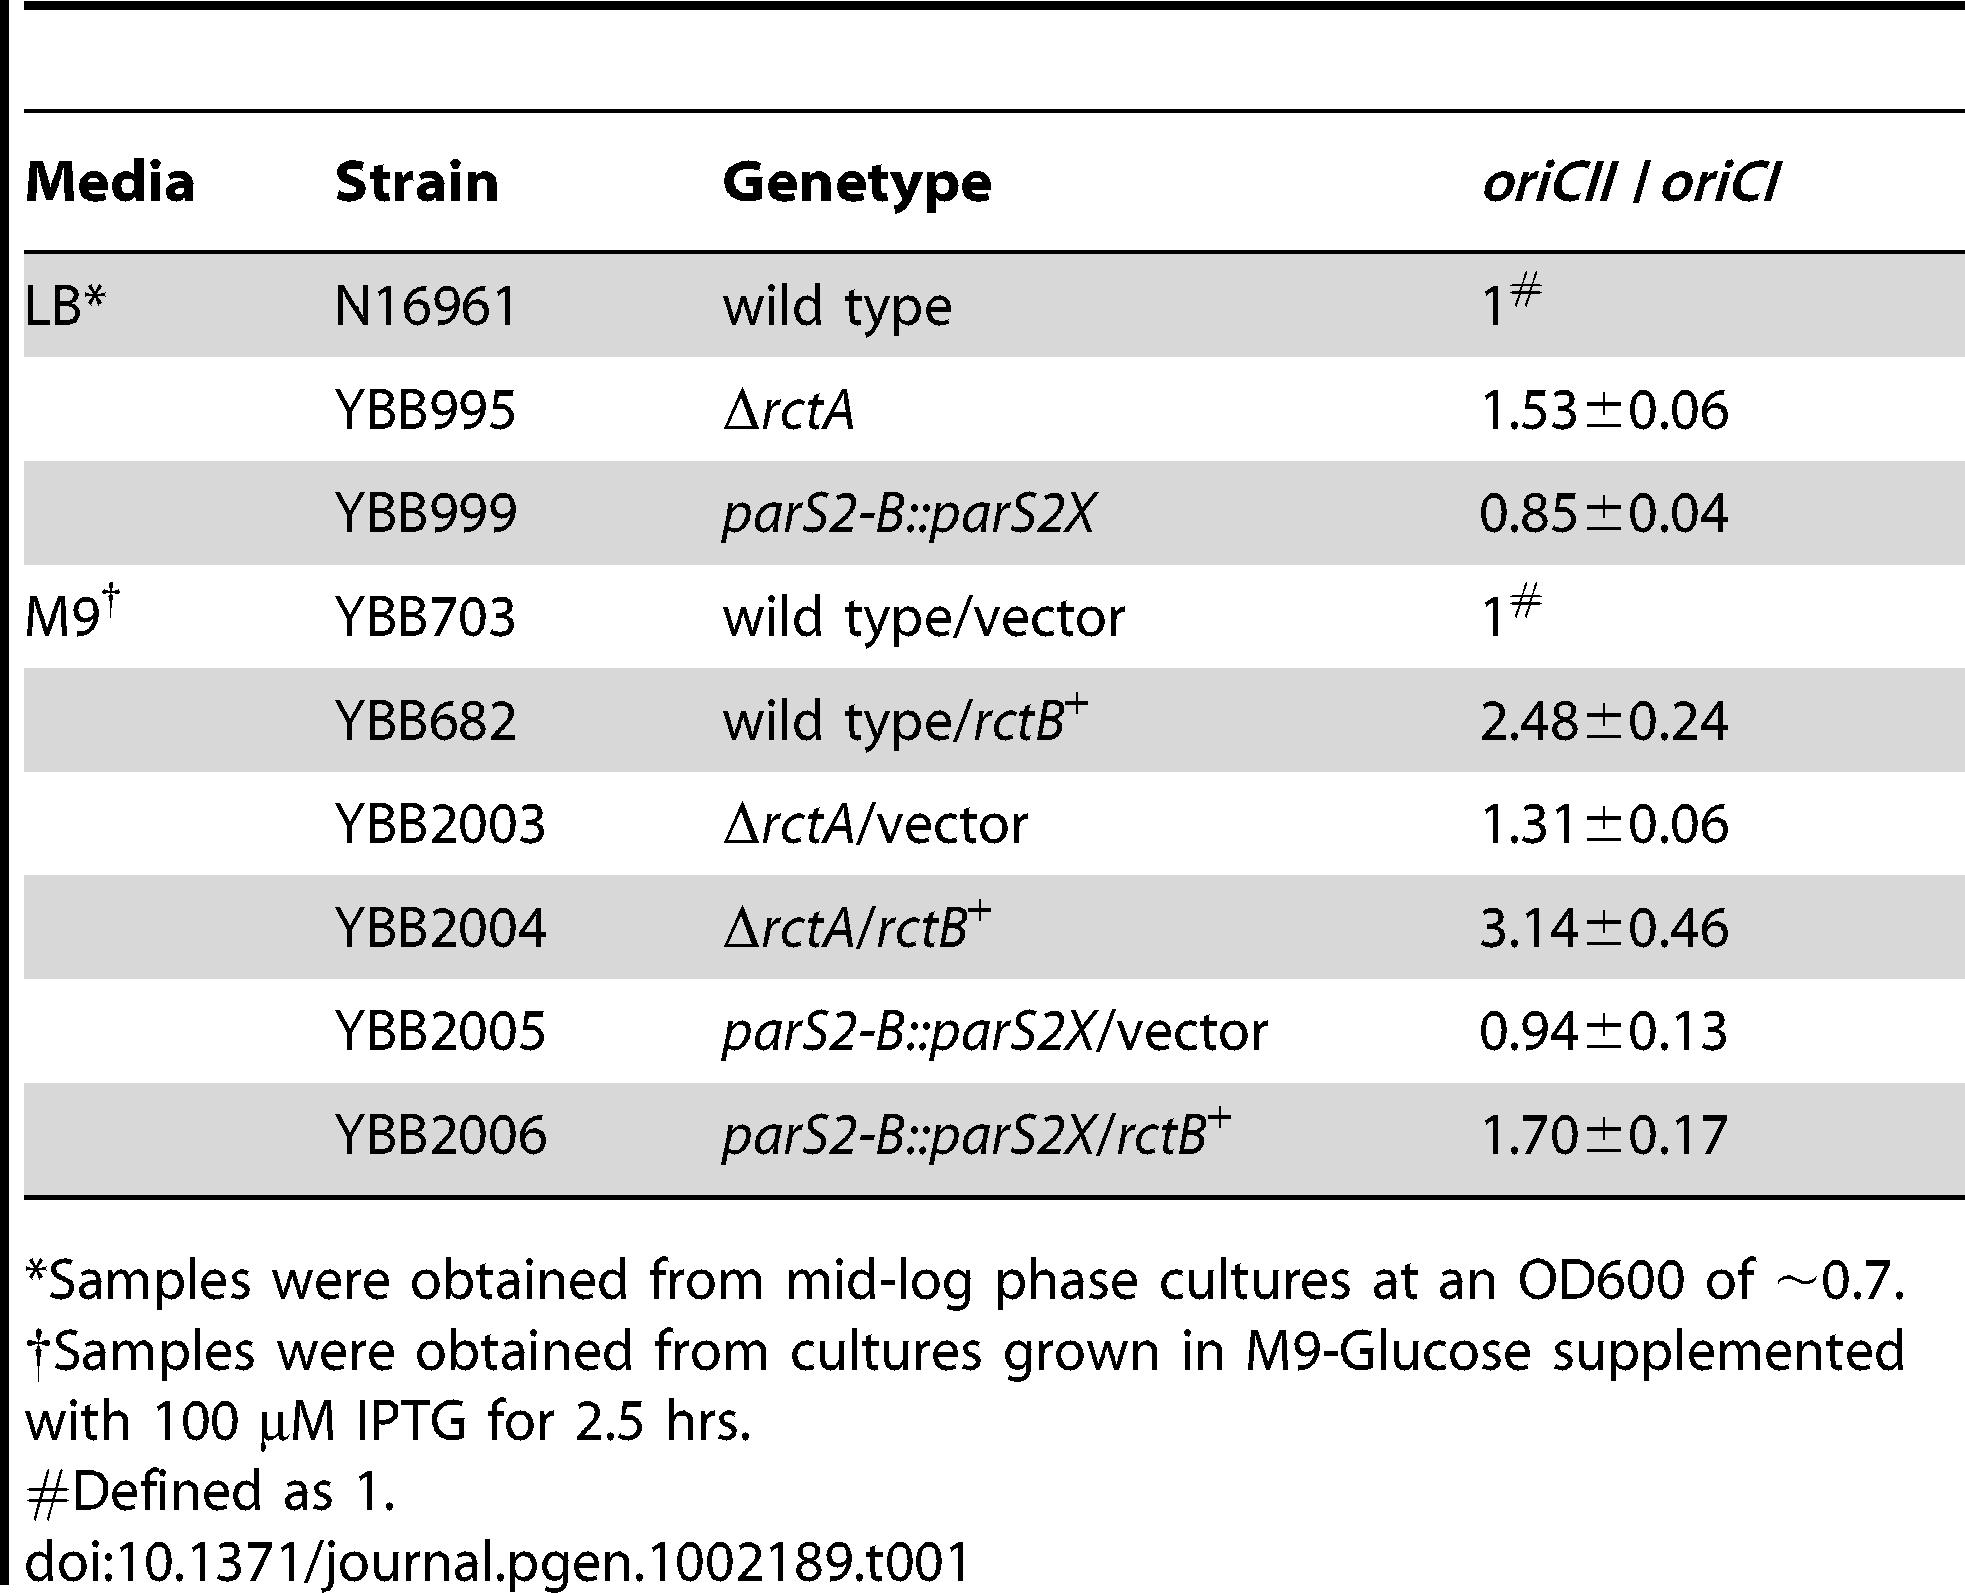 Ratio of <i>oriCII</i>/<i>oriCI</i> in <i>V. cholerae</i> strains.